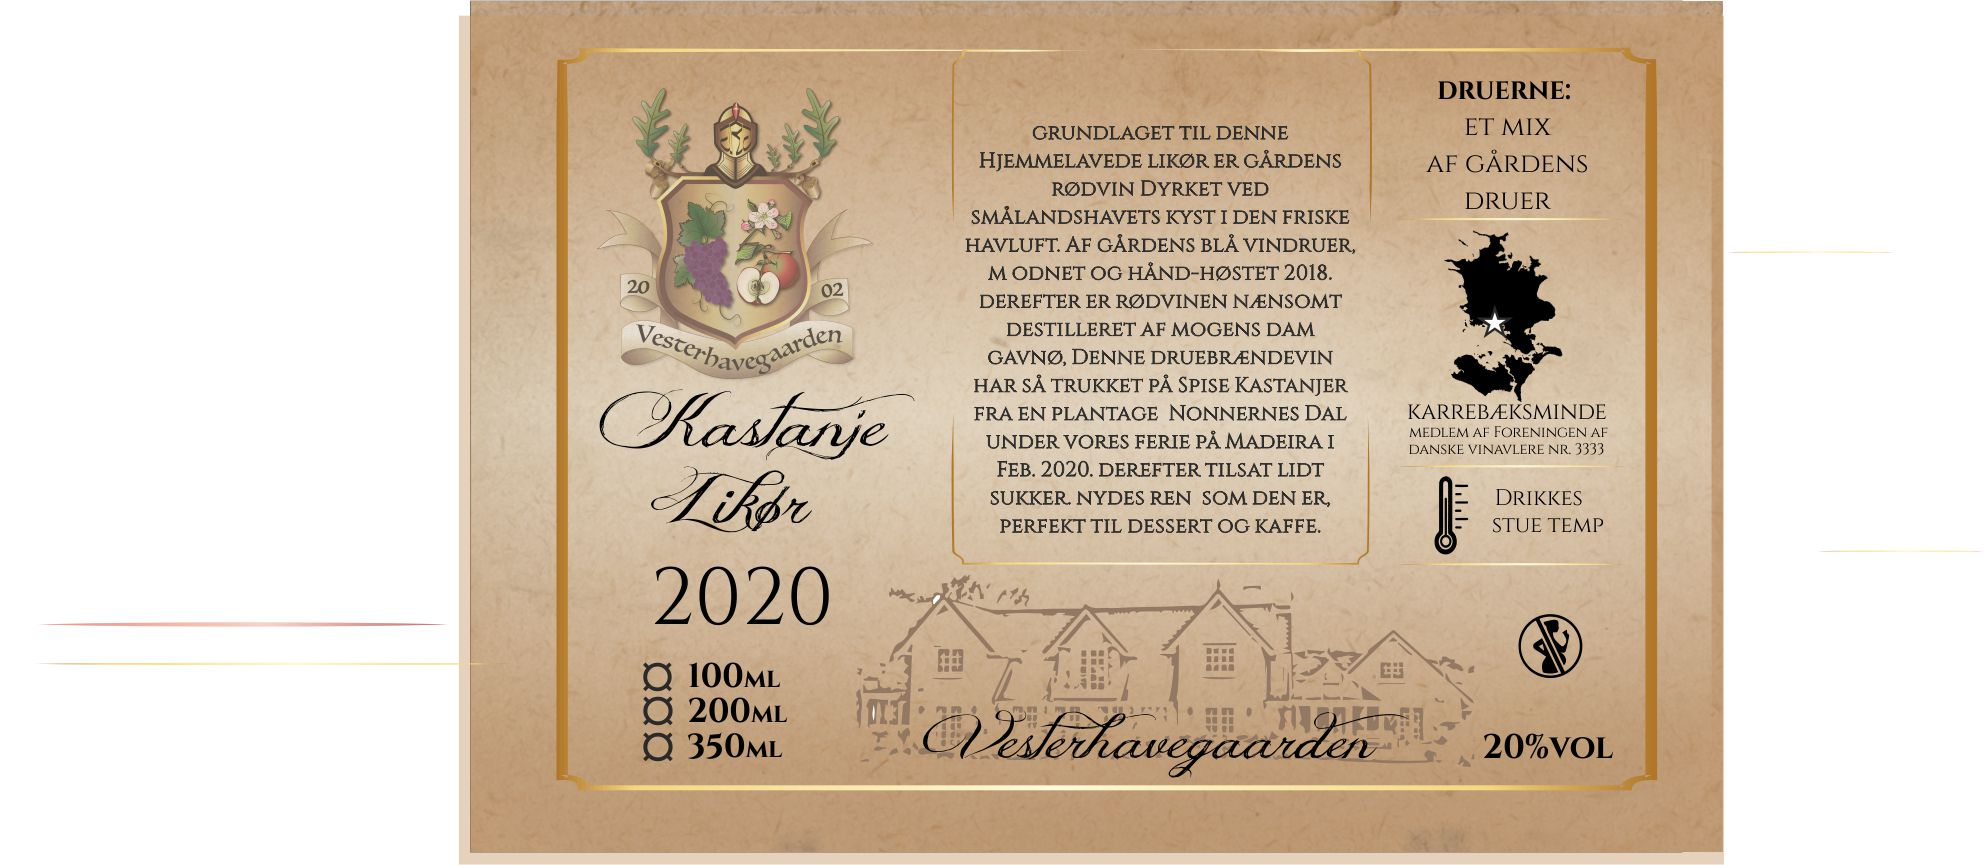 LIKØR, KASTANJE,  2020, 200ml, 20%